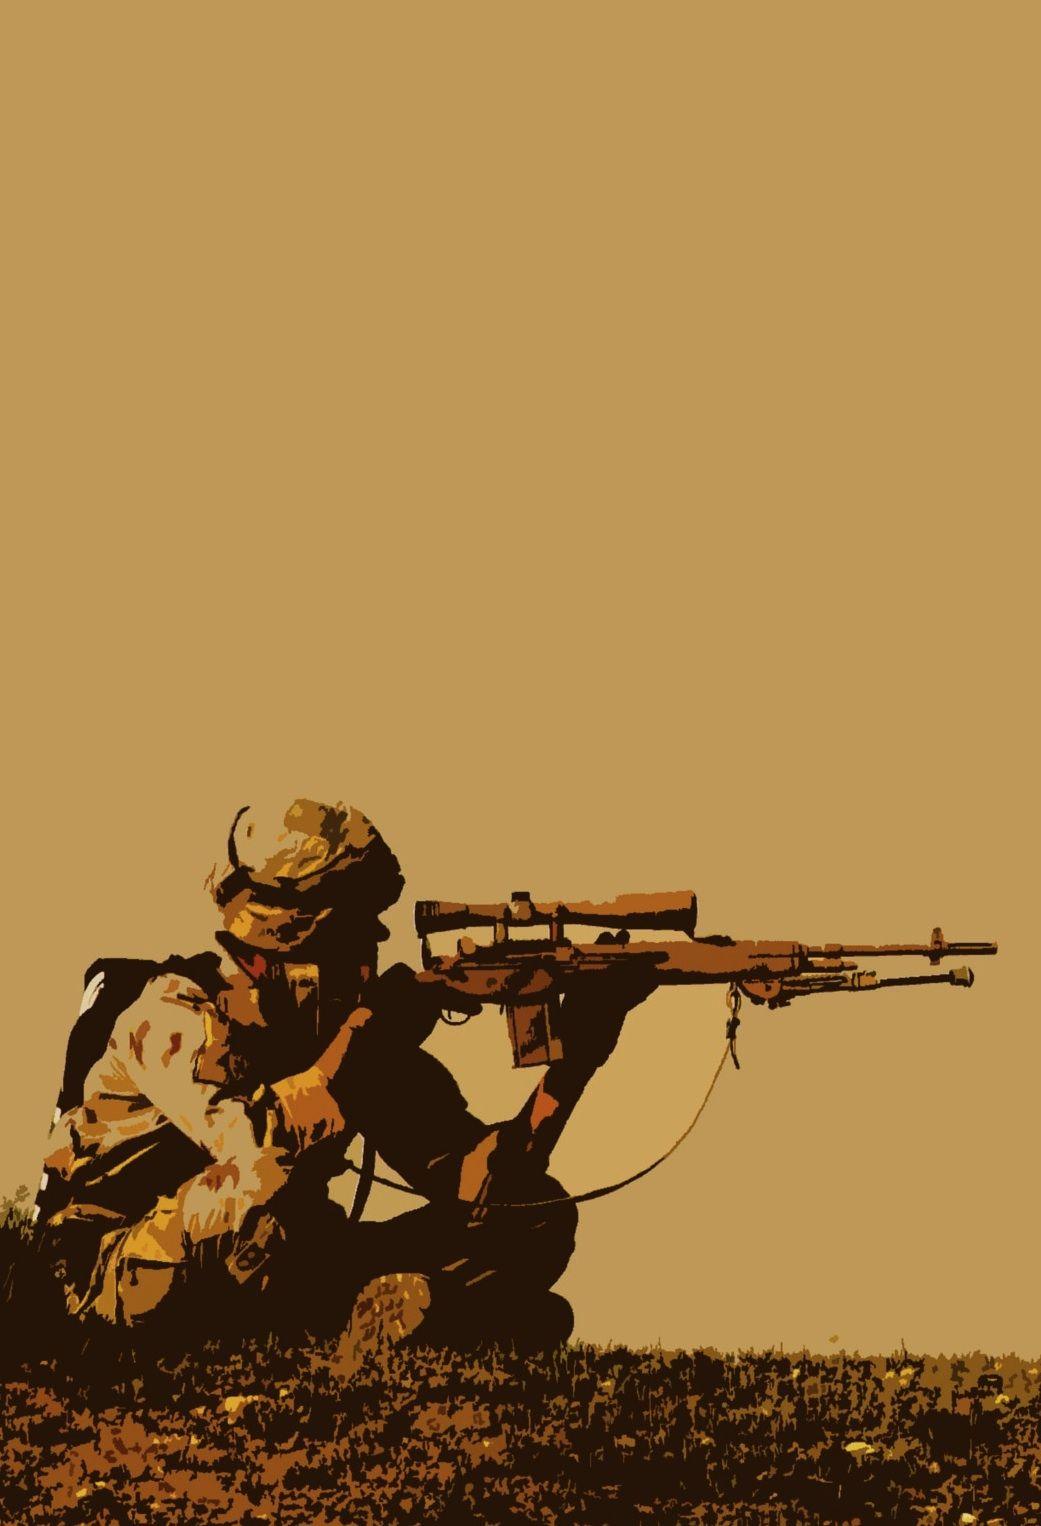 military iphone wallpapers army soldier backgrounds ios computer phone wallpapersafari enjpg wallpapersun kaynak rate please